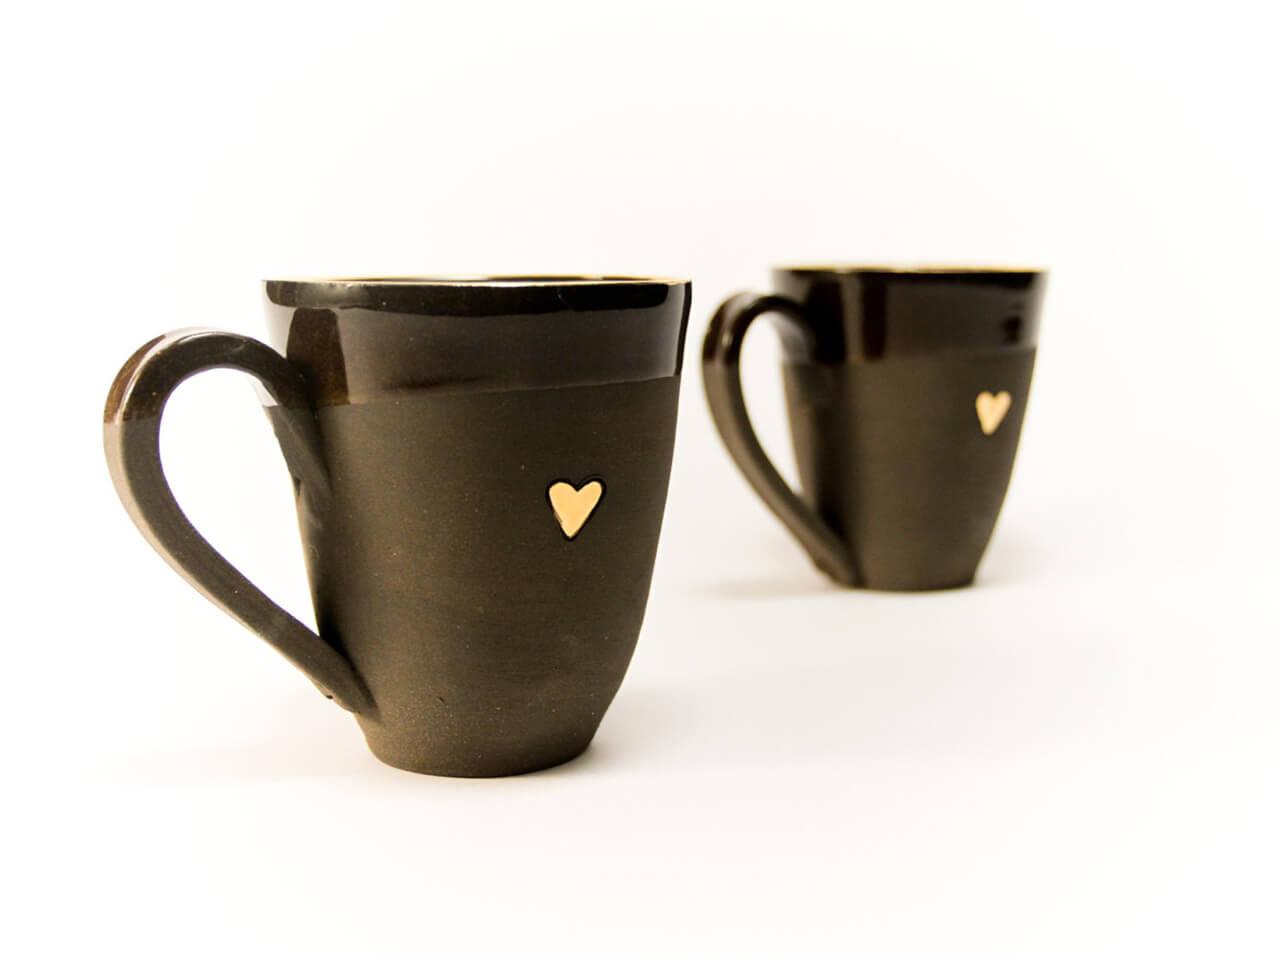 Handmade Black Coffee Mug With Gold Heart